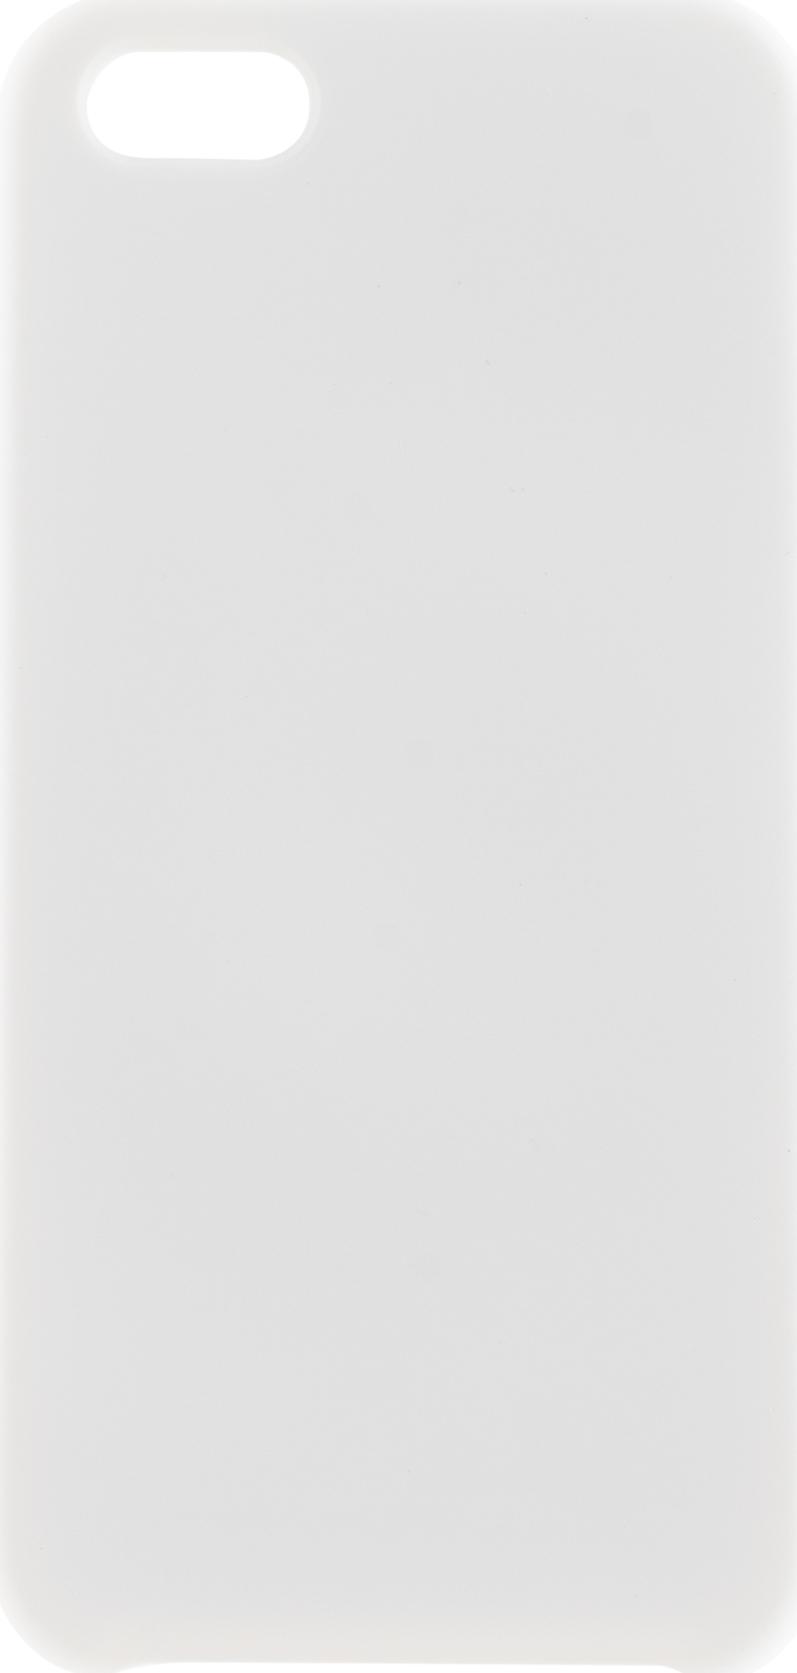 Чехол Brosco Softrubber для Apple iPhone 5, белый аксессуар чехол для apple iphone 6 brosco soft rubber black ip6 softrubber black